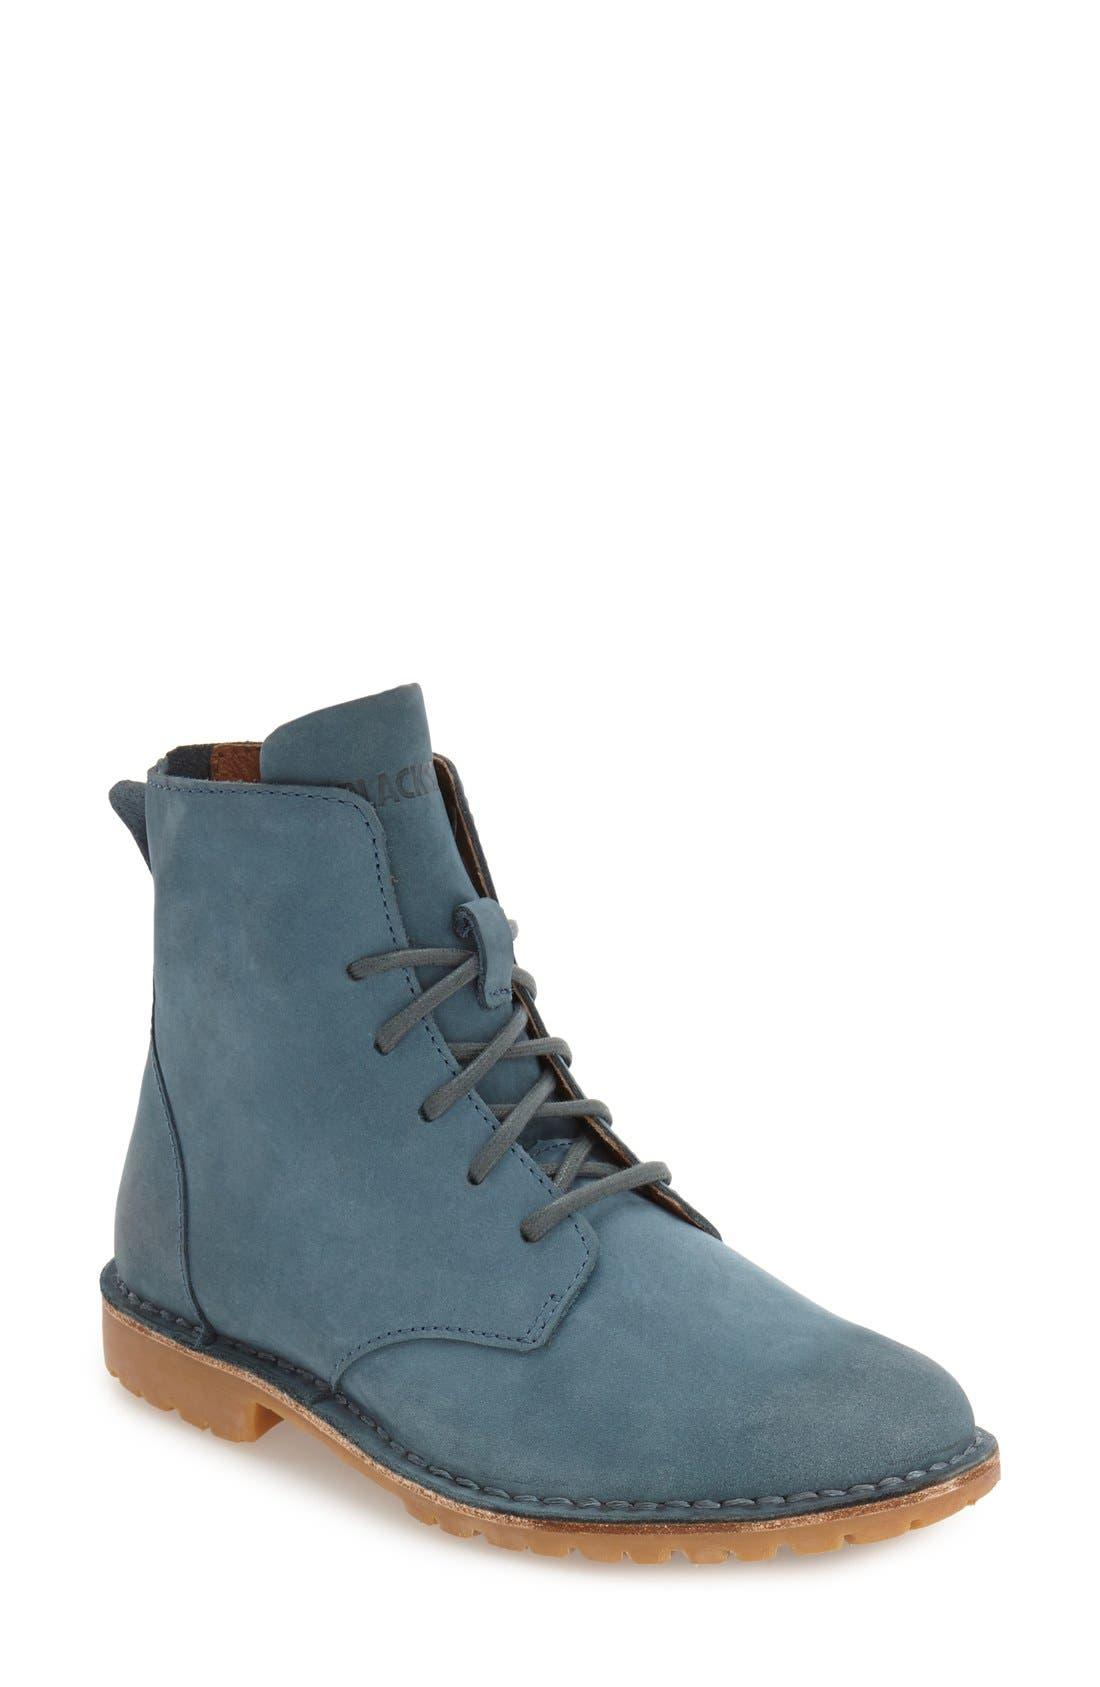 Blackstone 'KL67' Lace-Up Boot (Women)